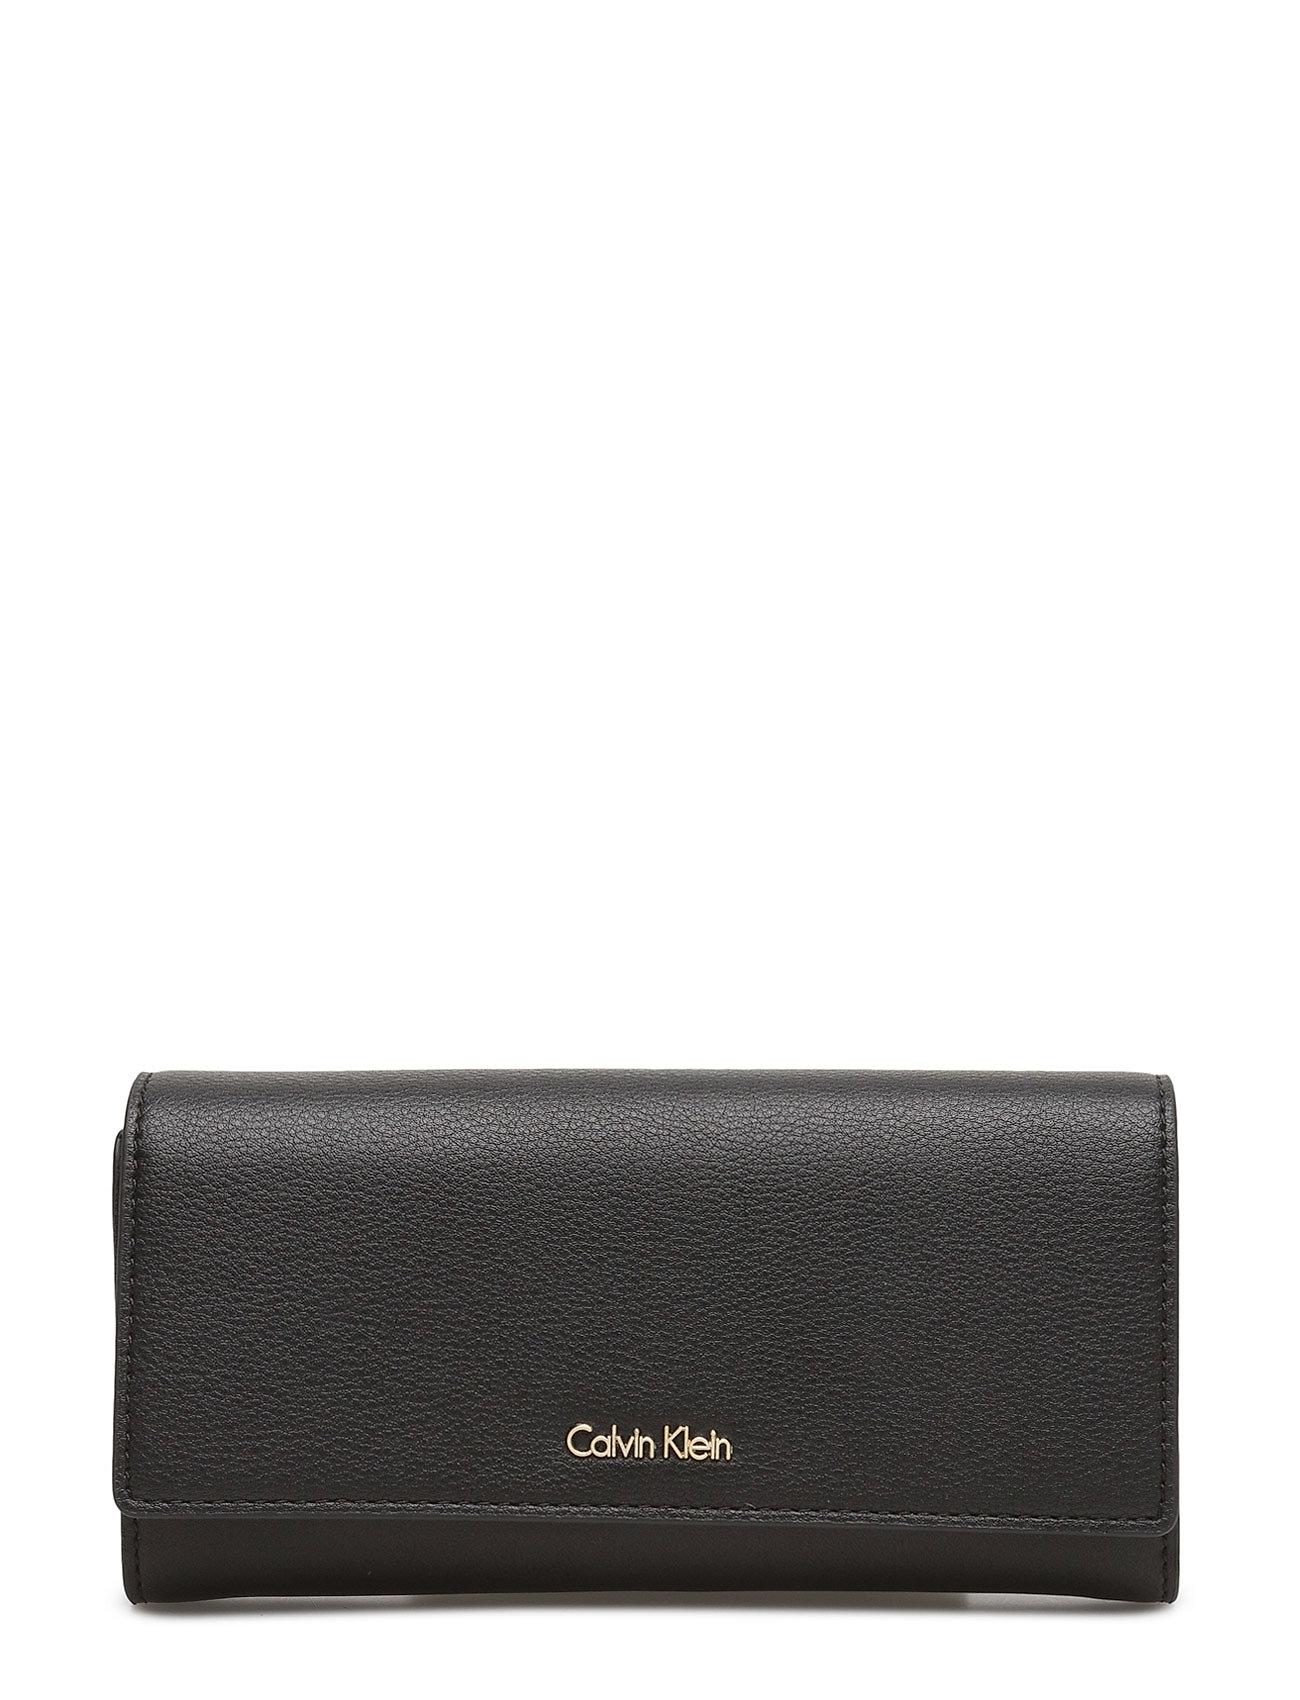 Calvin Klein MILLI3 LARGE TRIFOLD